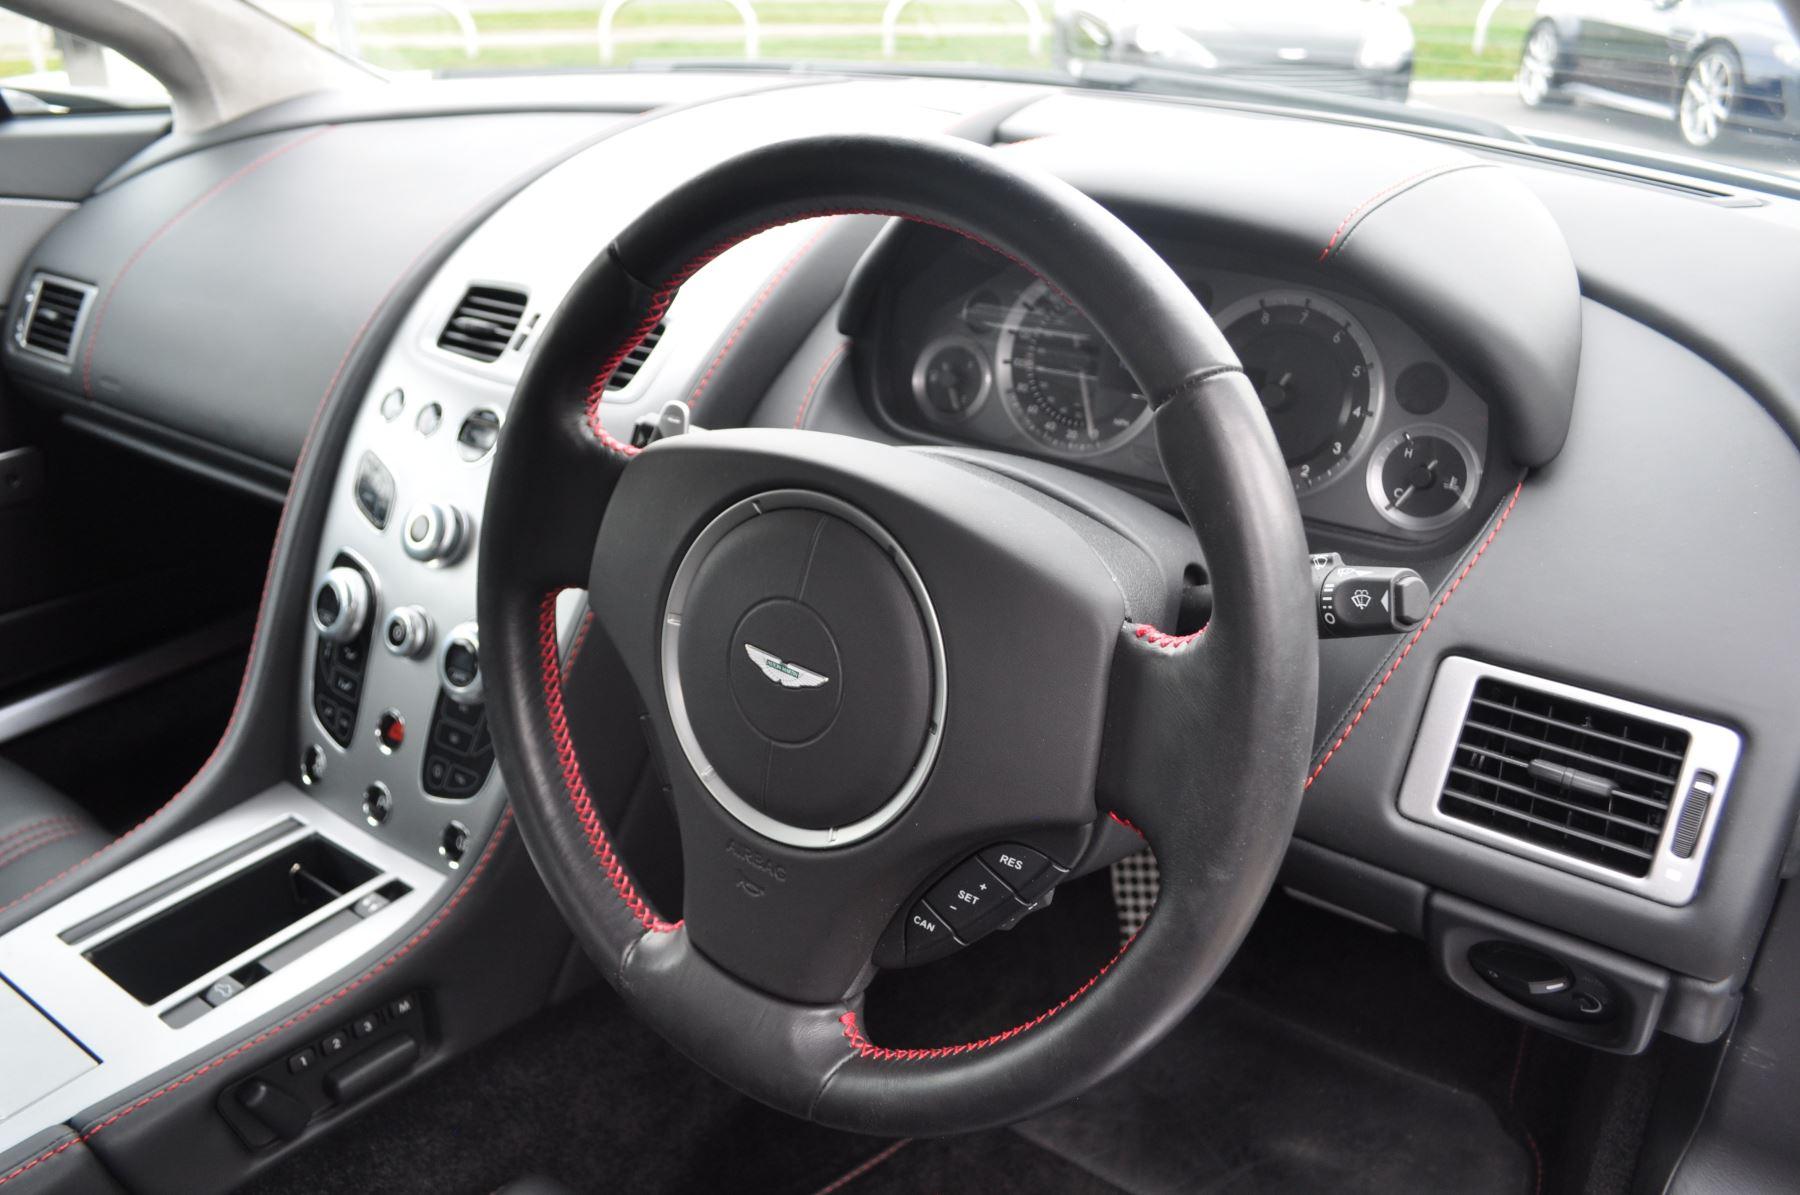 Aston Martin V8 Vantage S Coupe Coupe image 23